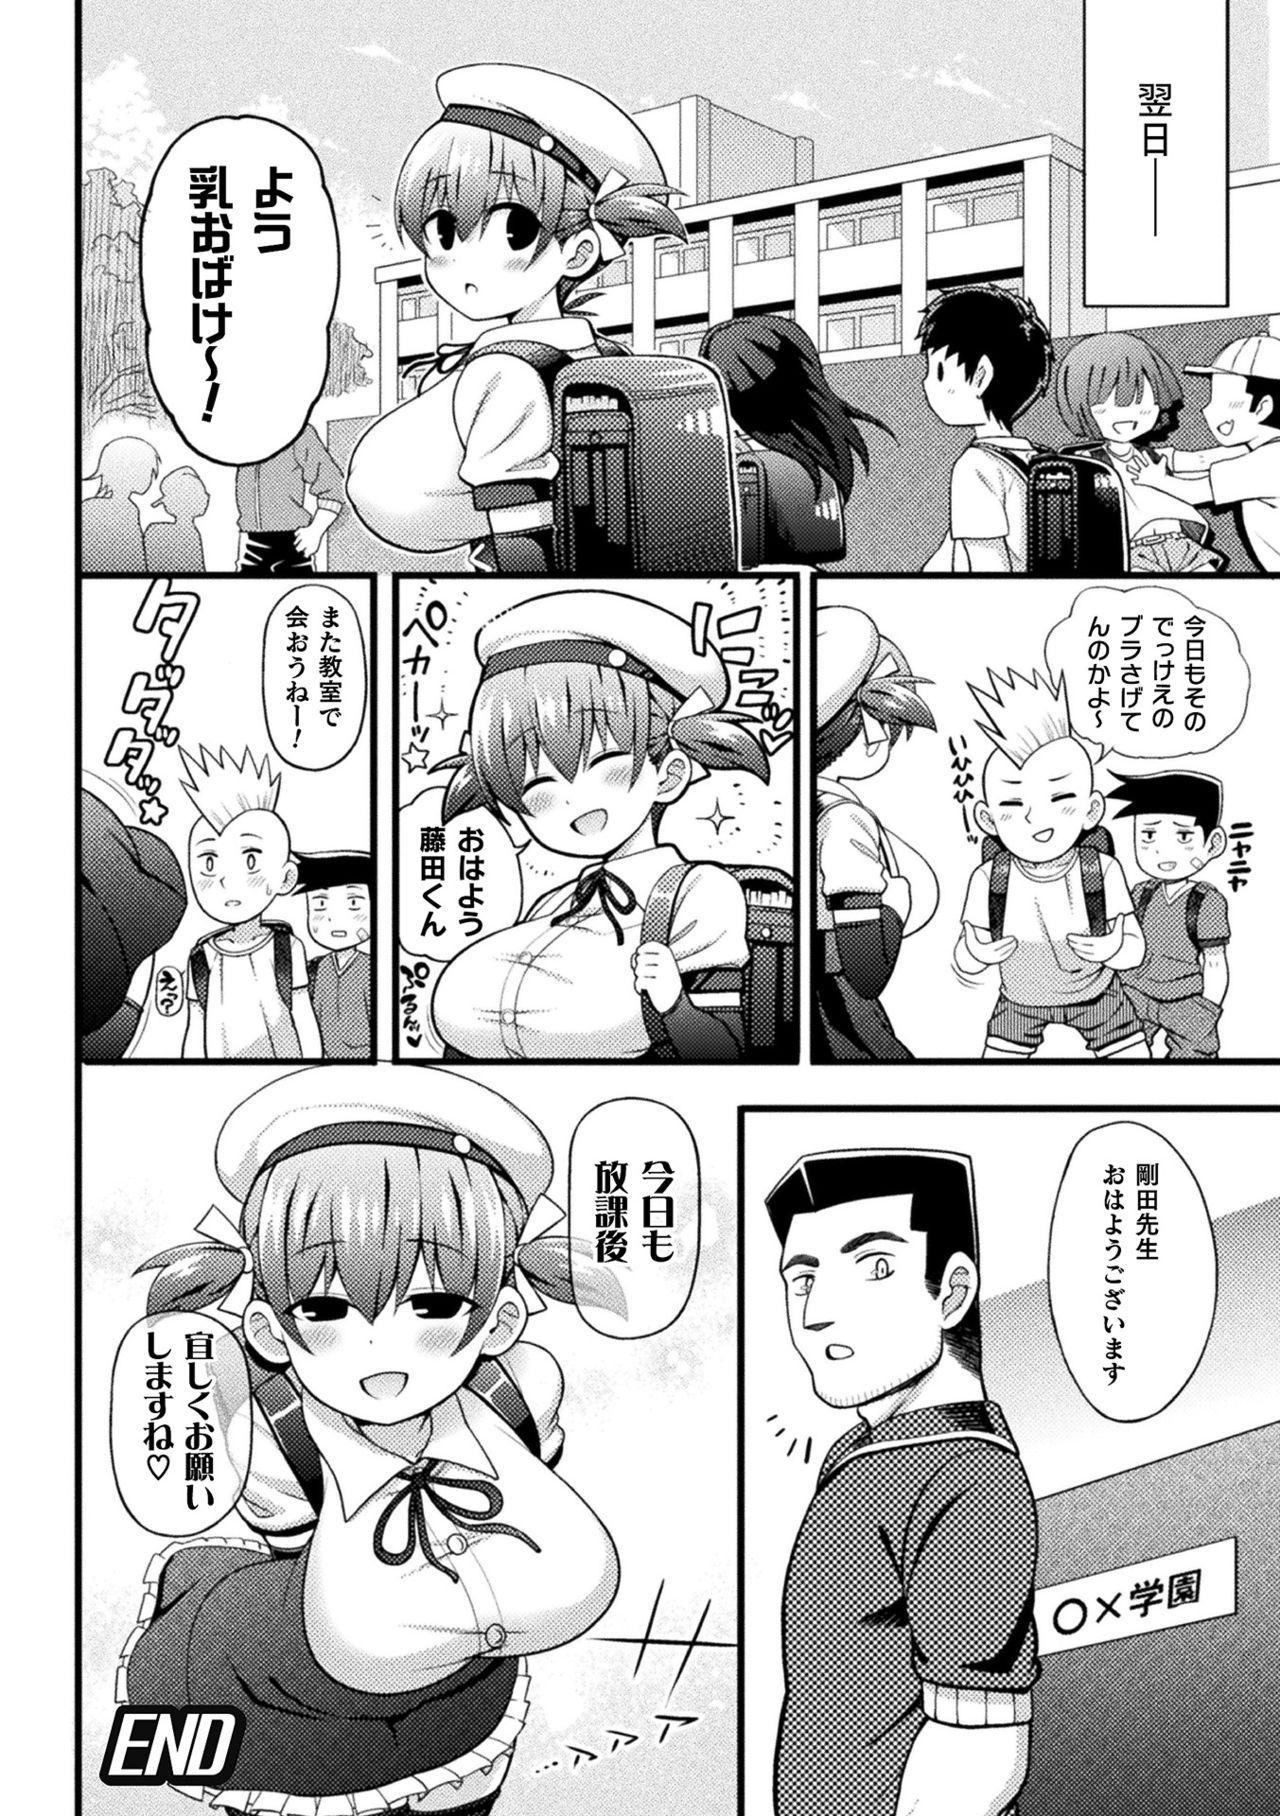 2D Comic Magazine Ero Chishiki 0 na Heroine Damashite Ryoujoku Muchix! Vol. 1 61